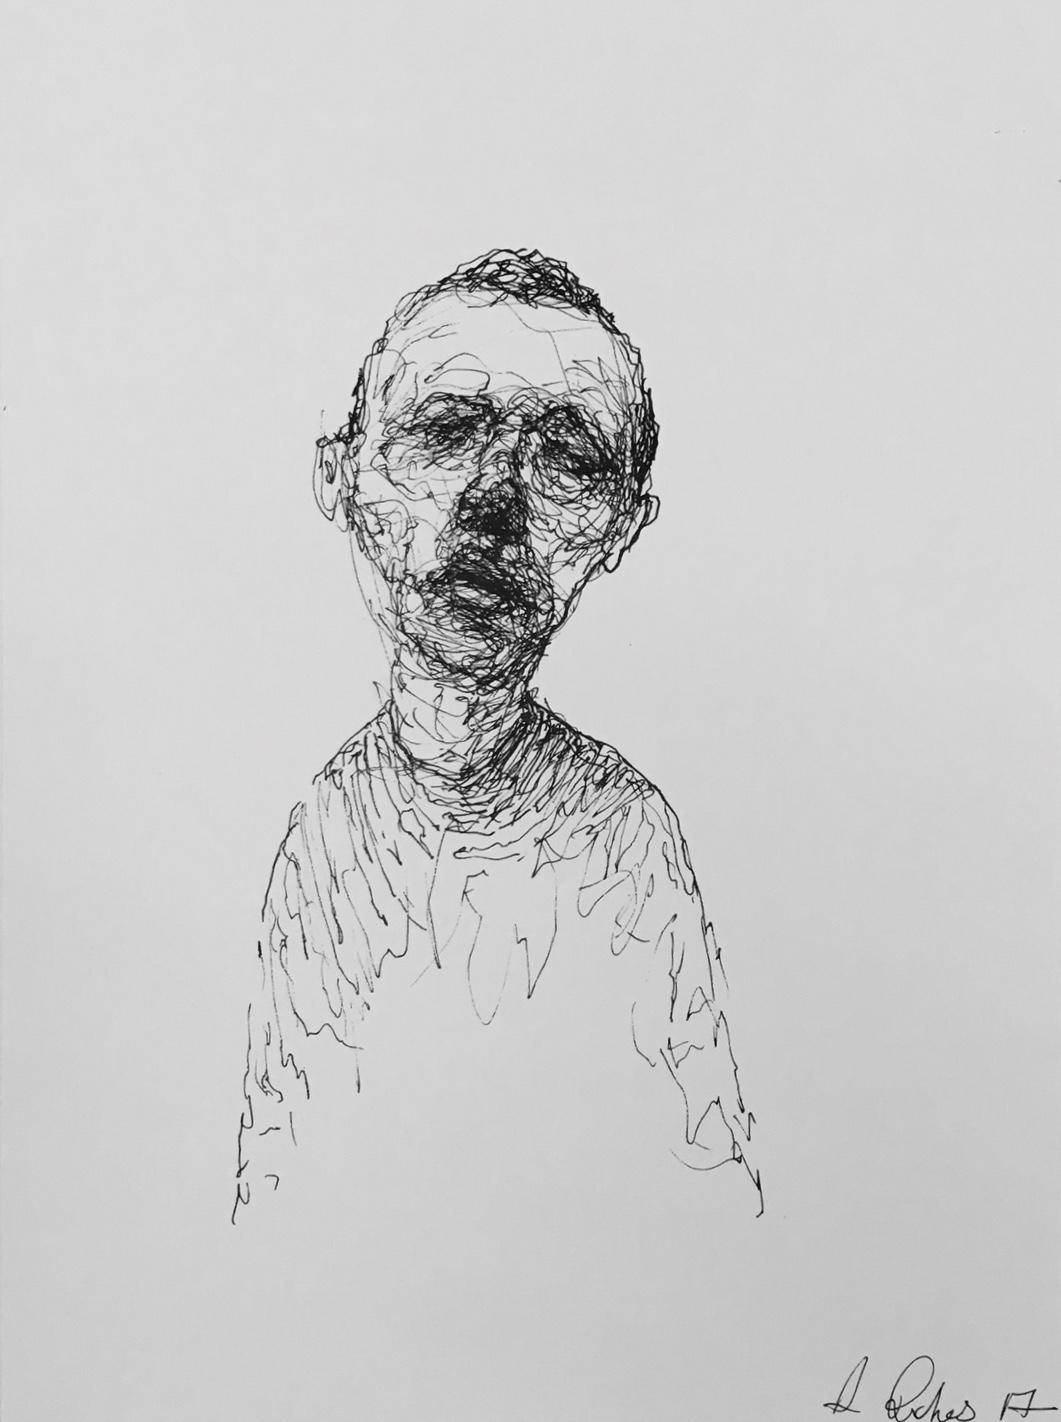 Untitled, 2017 | Pen on paper |28.8 x 21 cm